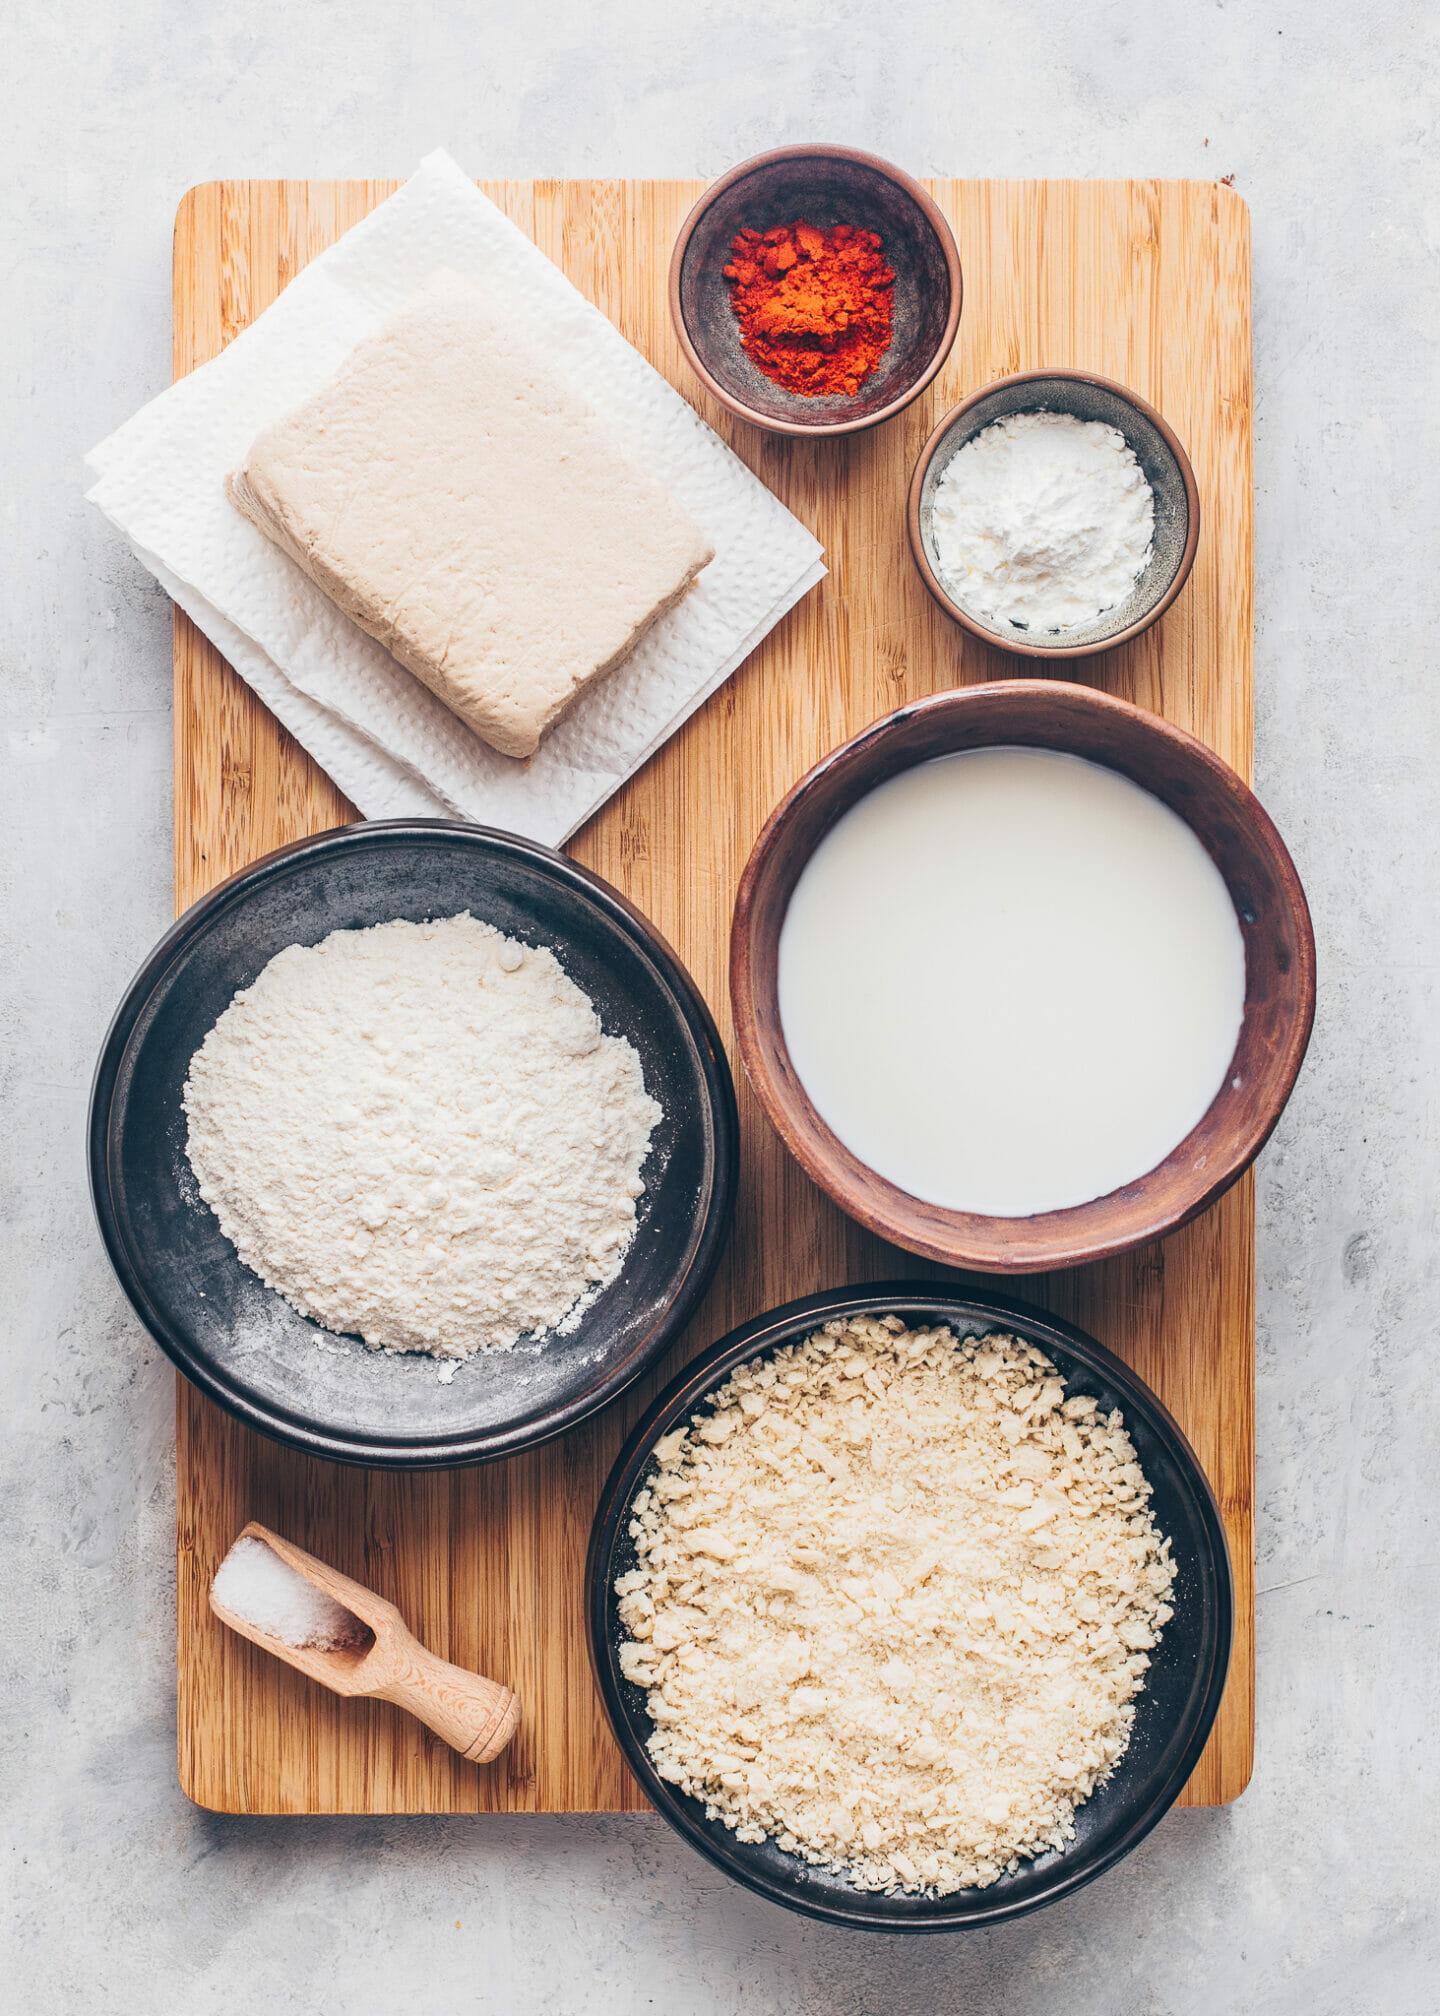 Ingredients for Tofu Breading